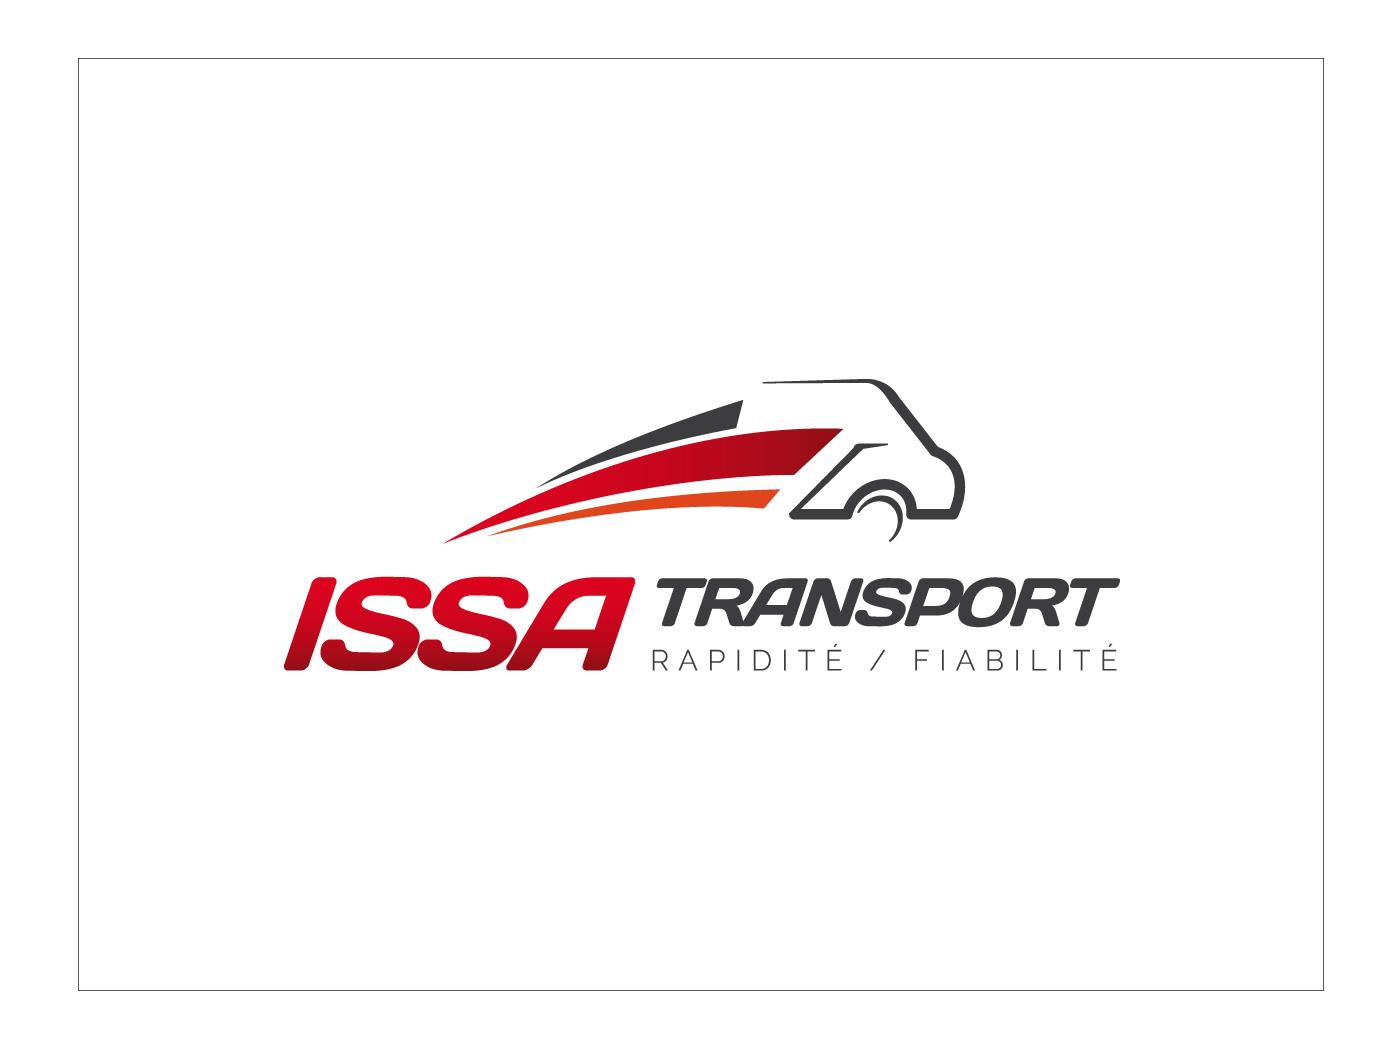 logo-issa-transport-gilles-cozzolino-graphiste-aix-en-provence-marseille